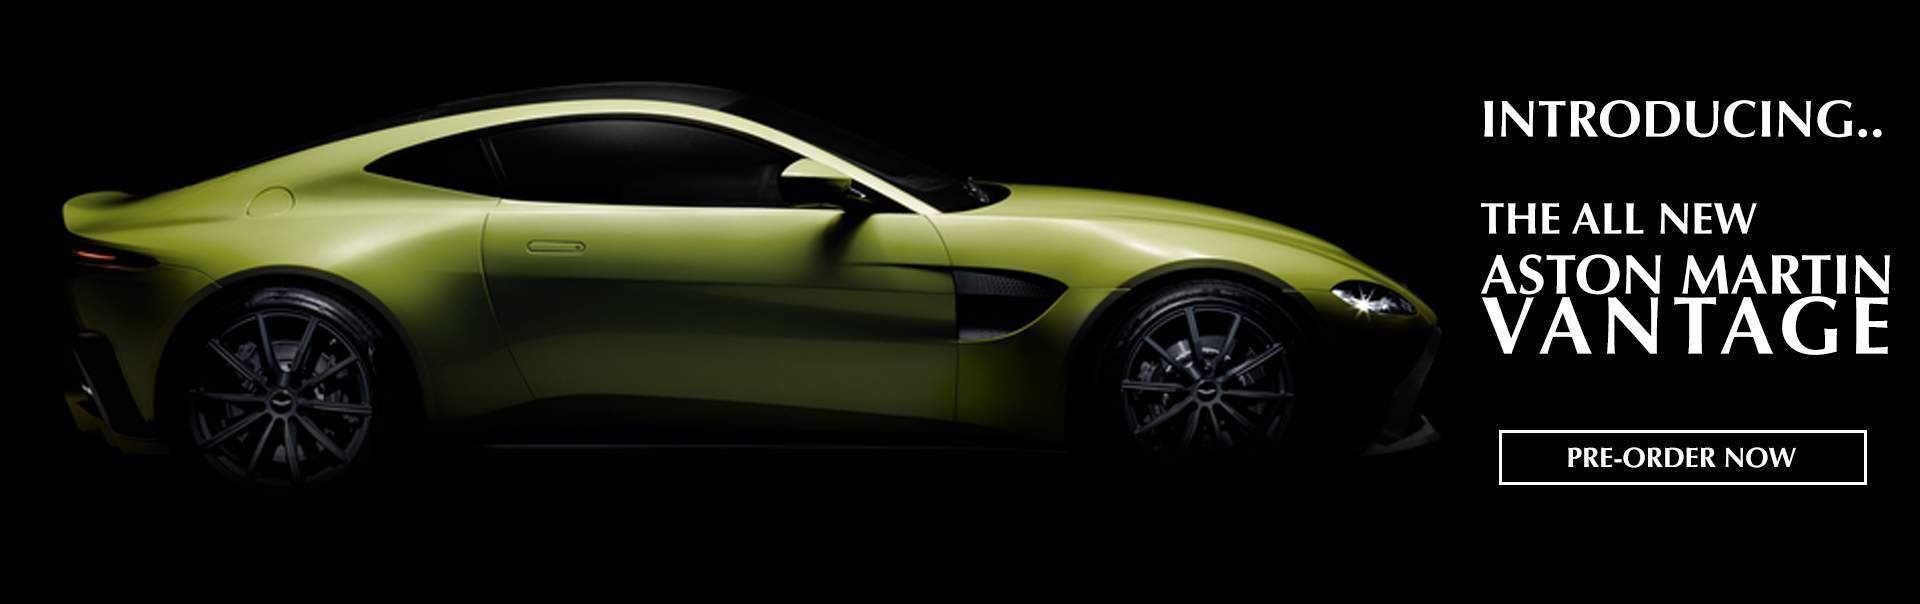 Los Gatos Luxury Cars | New & Used Cars | Auto Dealer